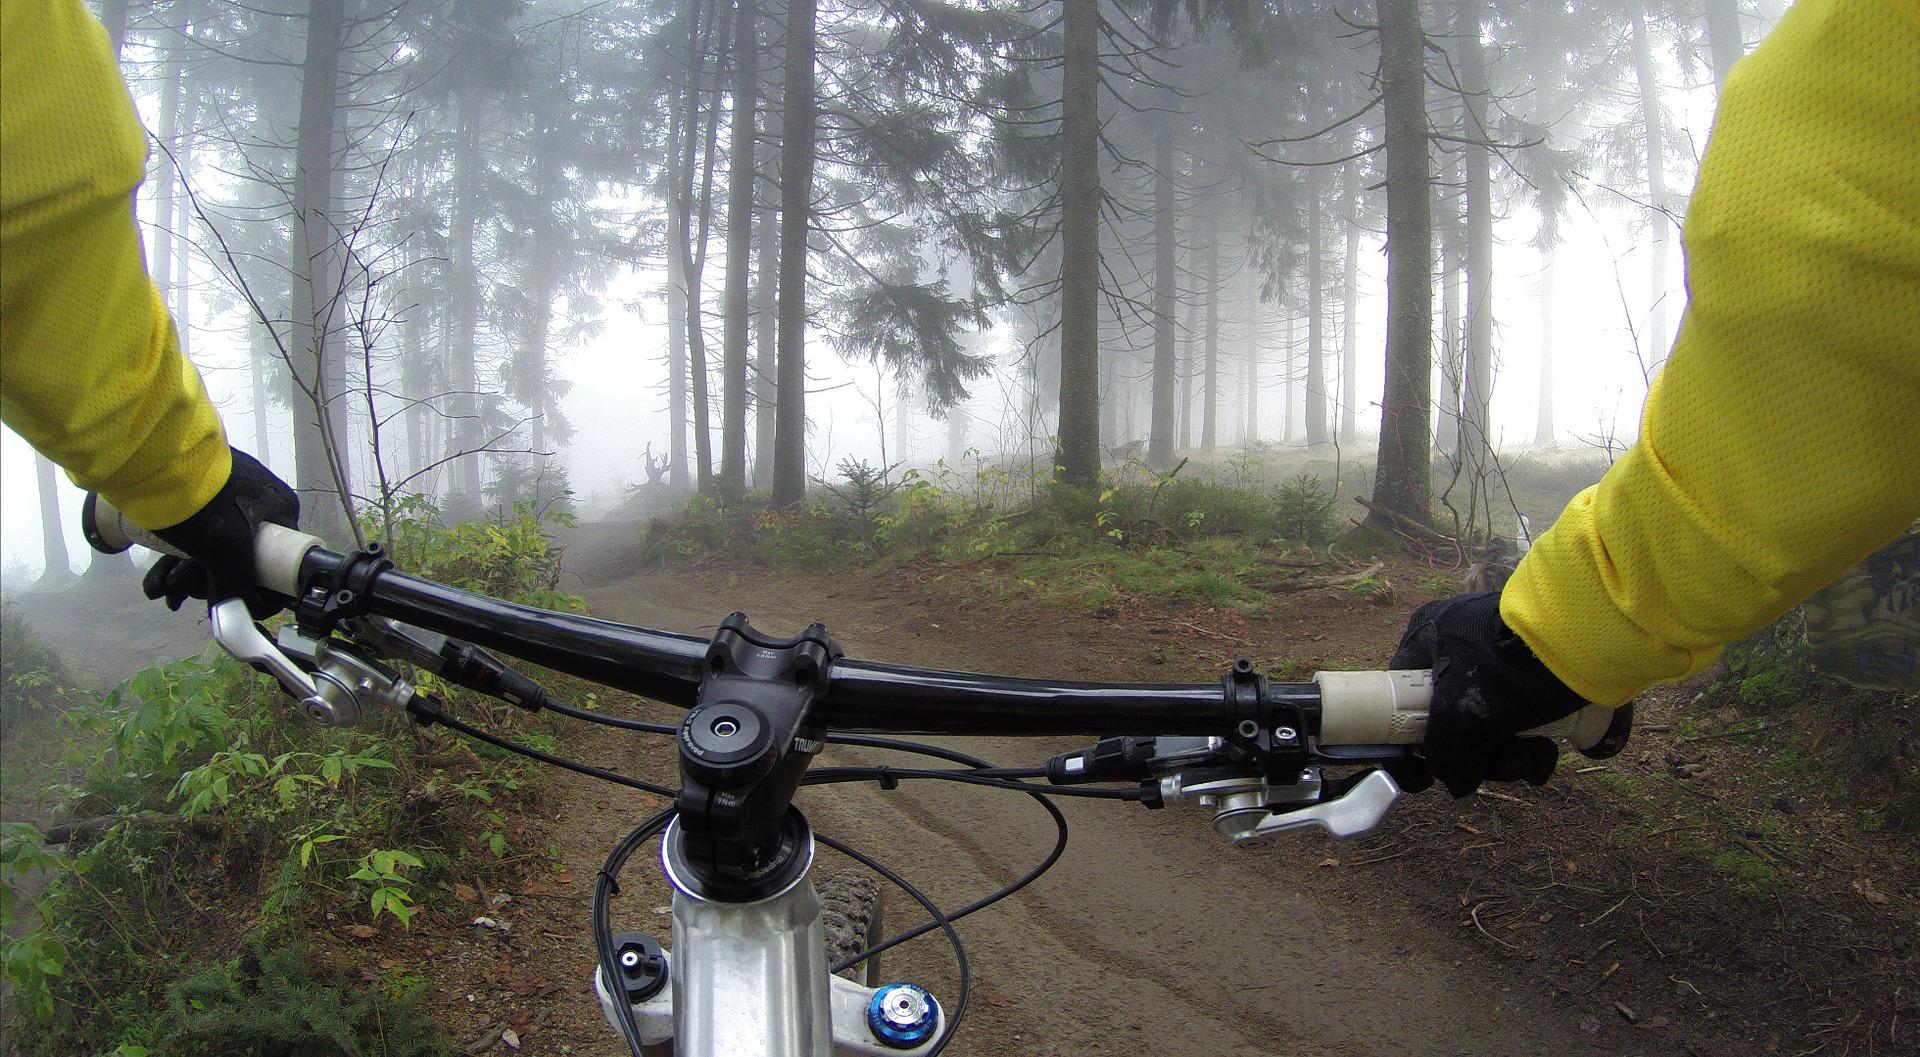 escursioni in bici umbria